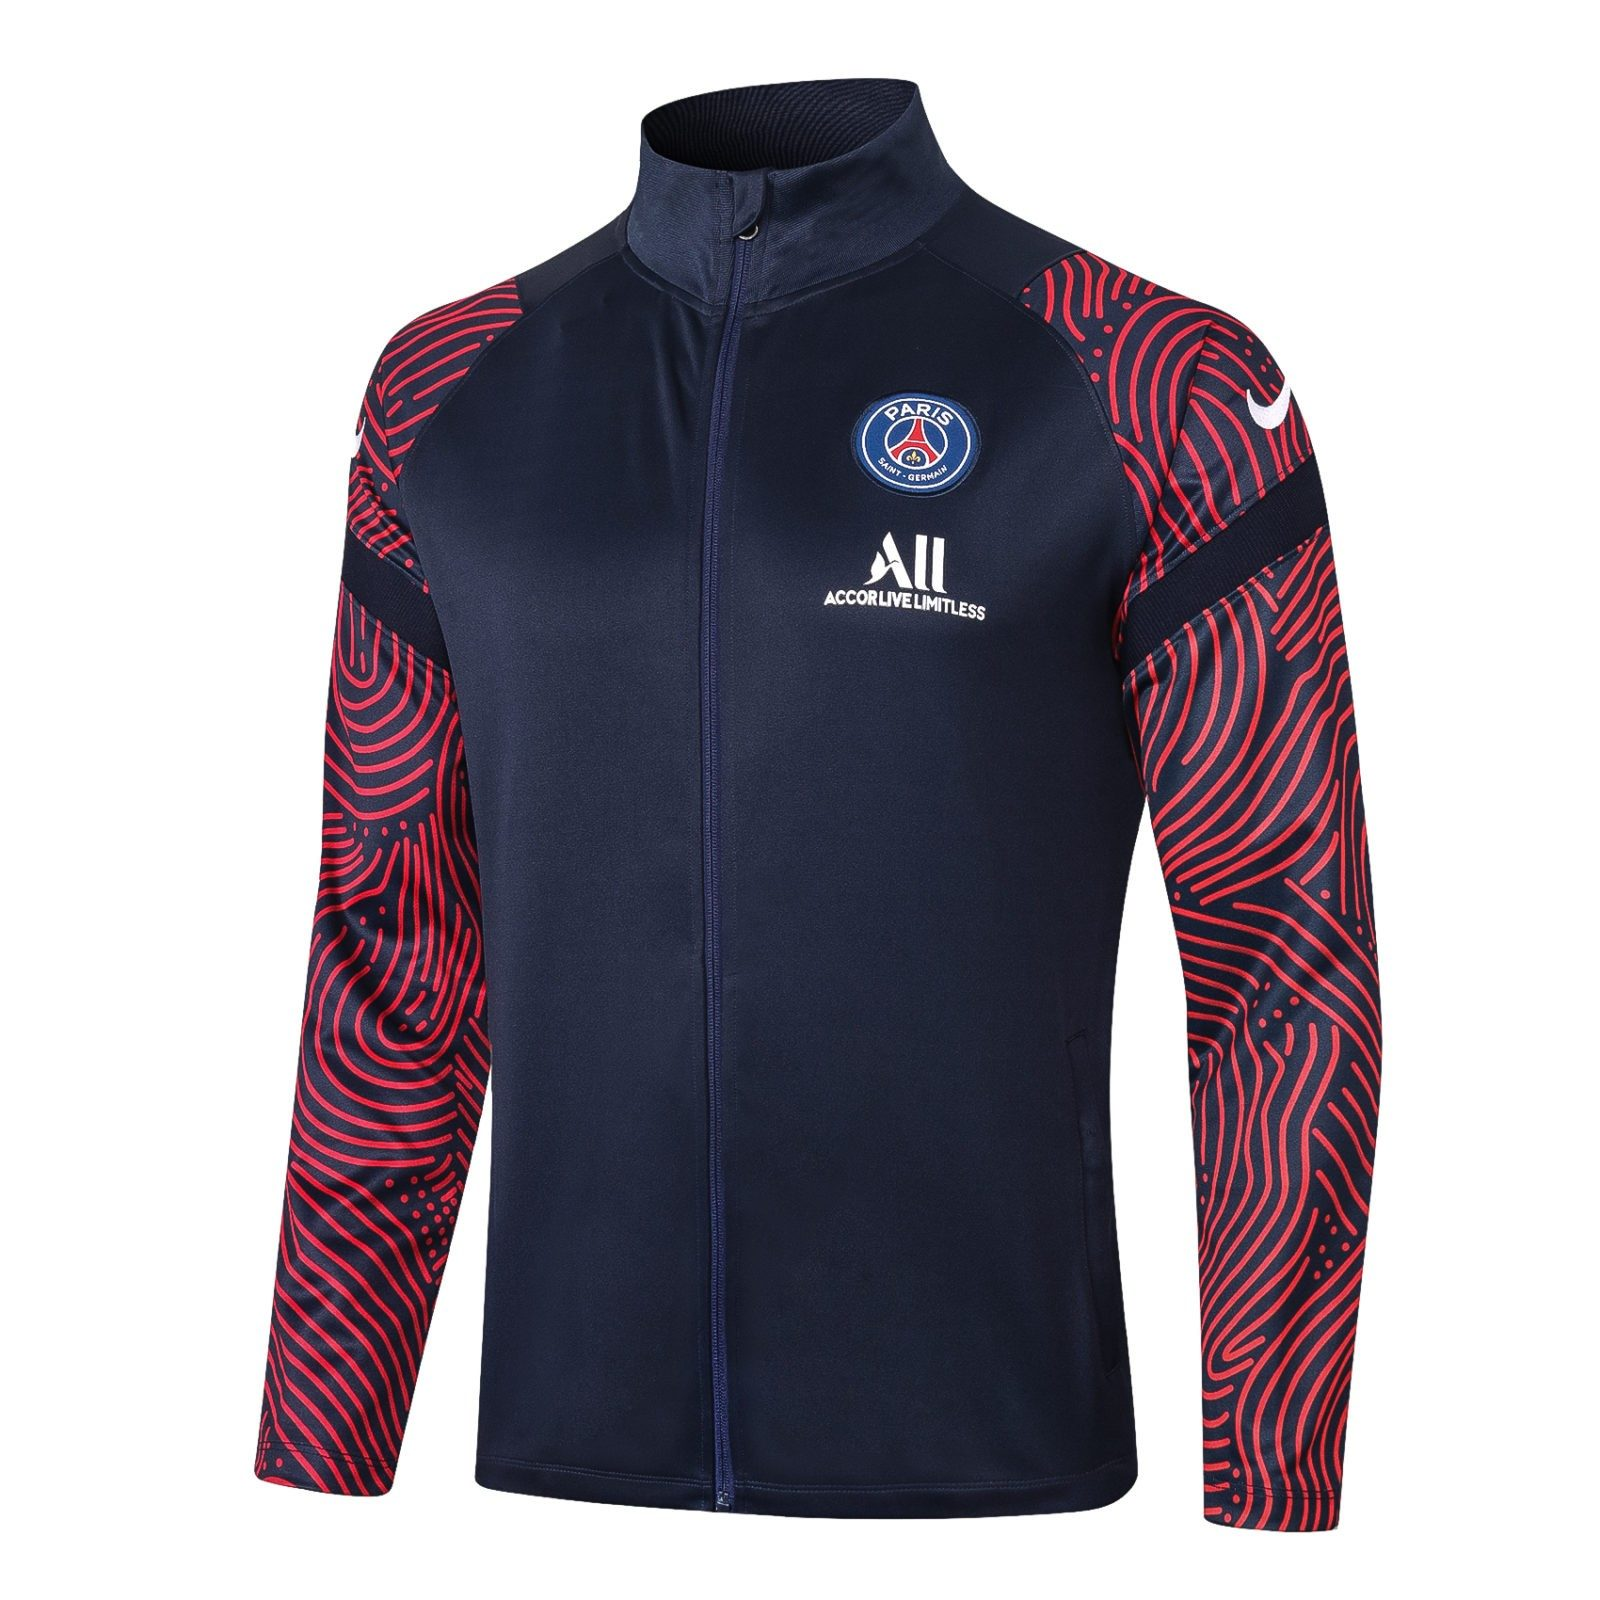 Олимпийка ПСЖ сезон 2020-2021 (Синяя)